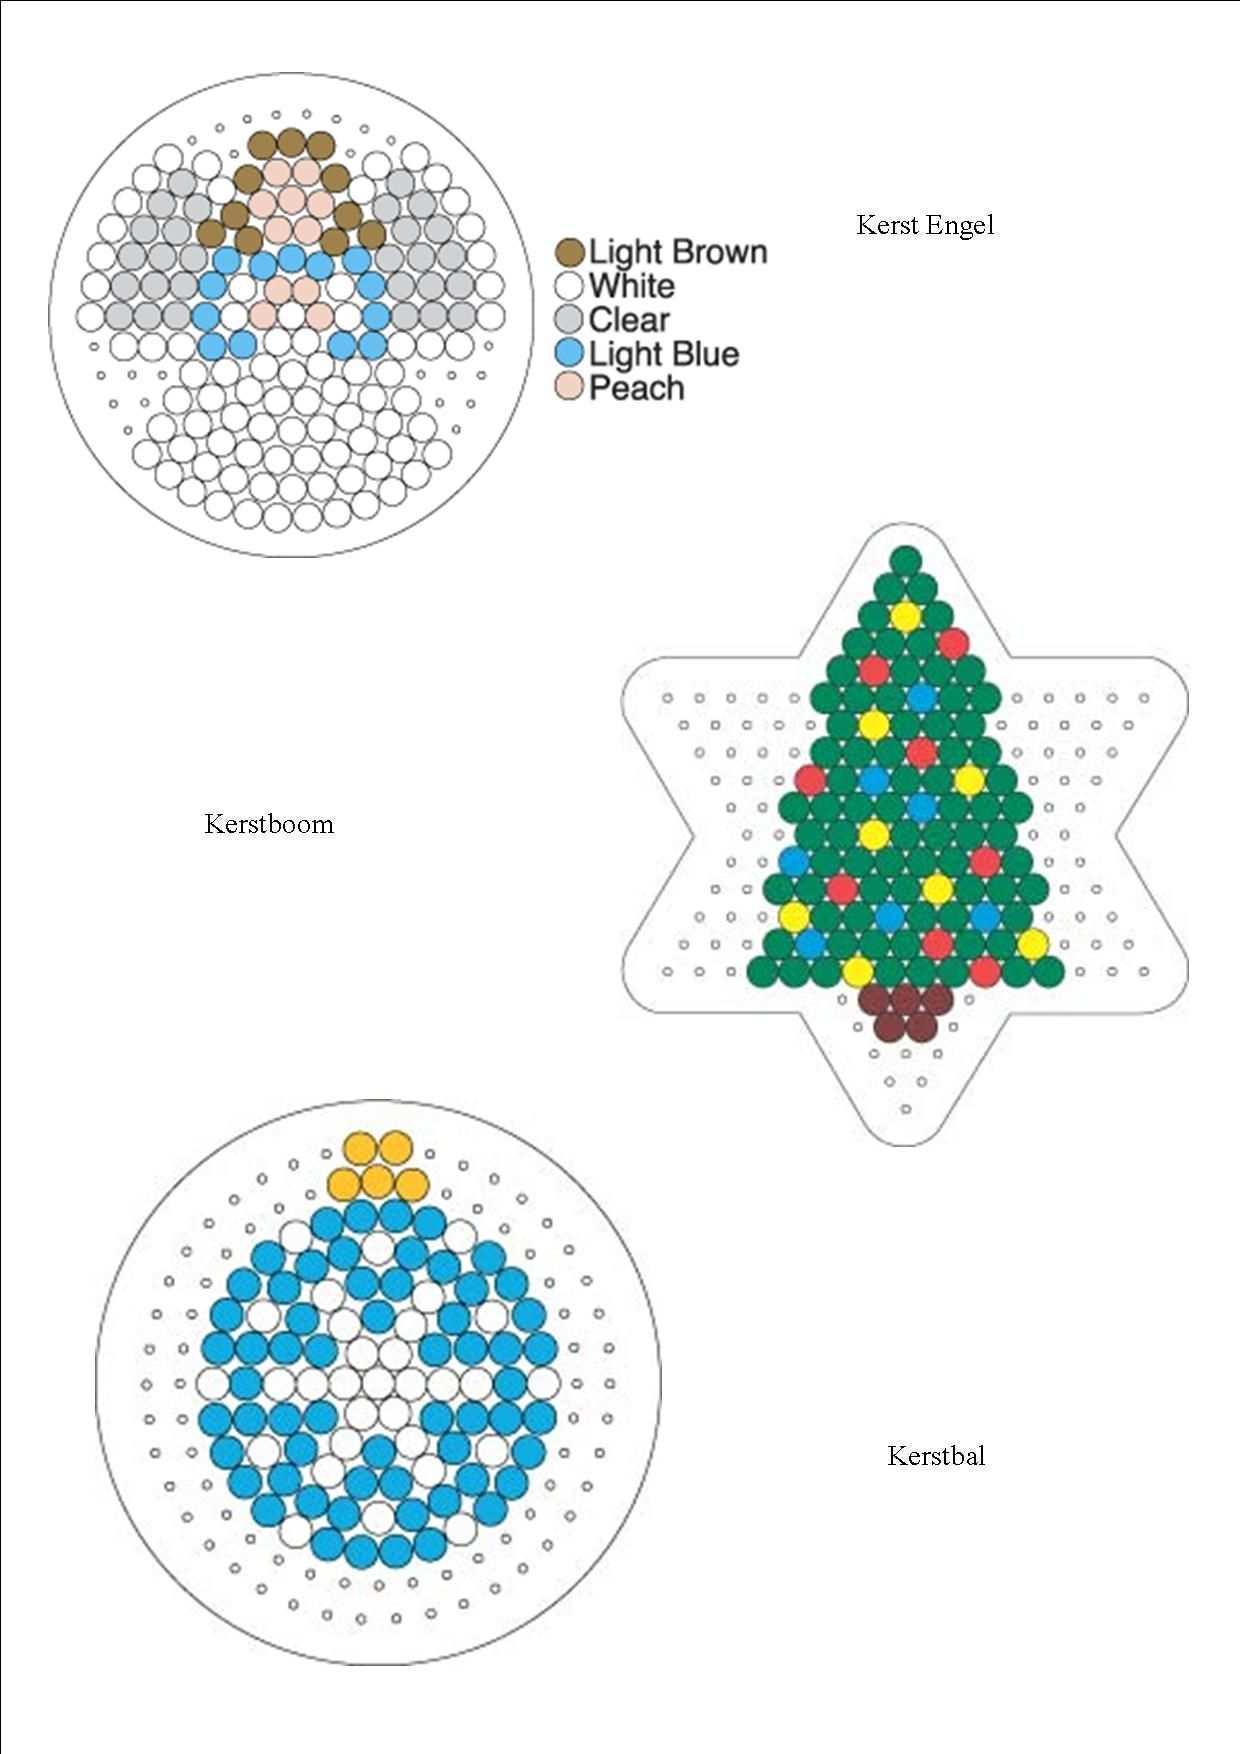 Christmas Perler Bead Patterns Angel Tree And Bauble Basteln Bugelperlen Basteln Mit Bugelperlen Weihnachten Buegelperlen Weihnachten